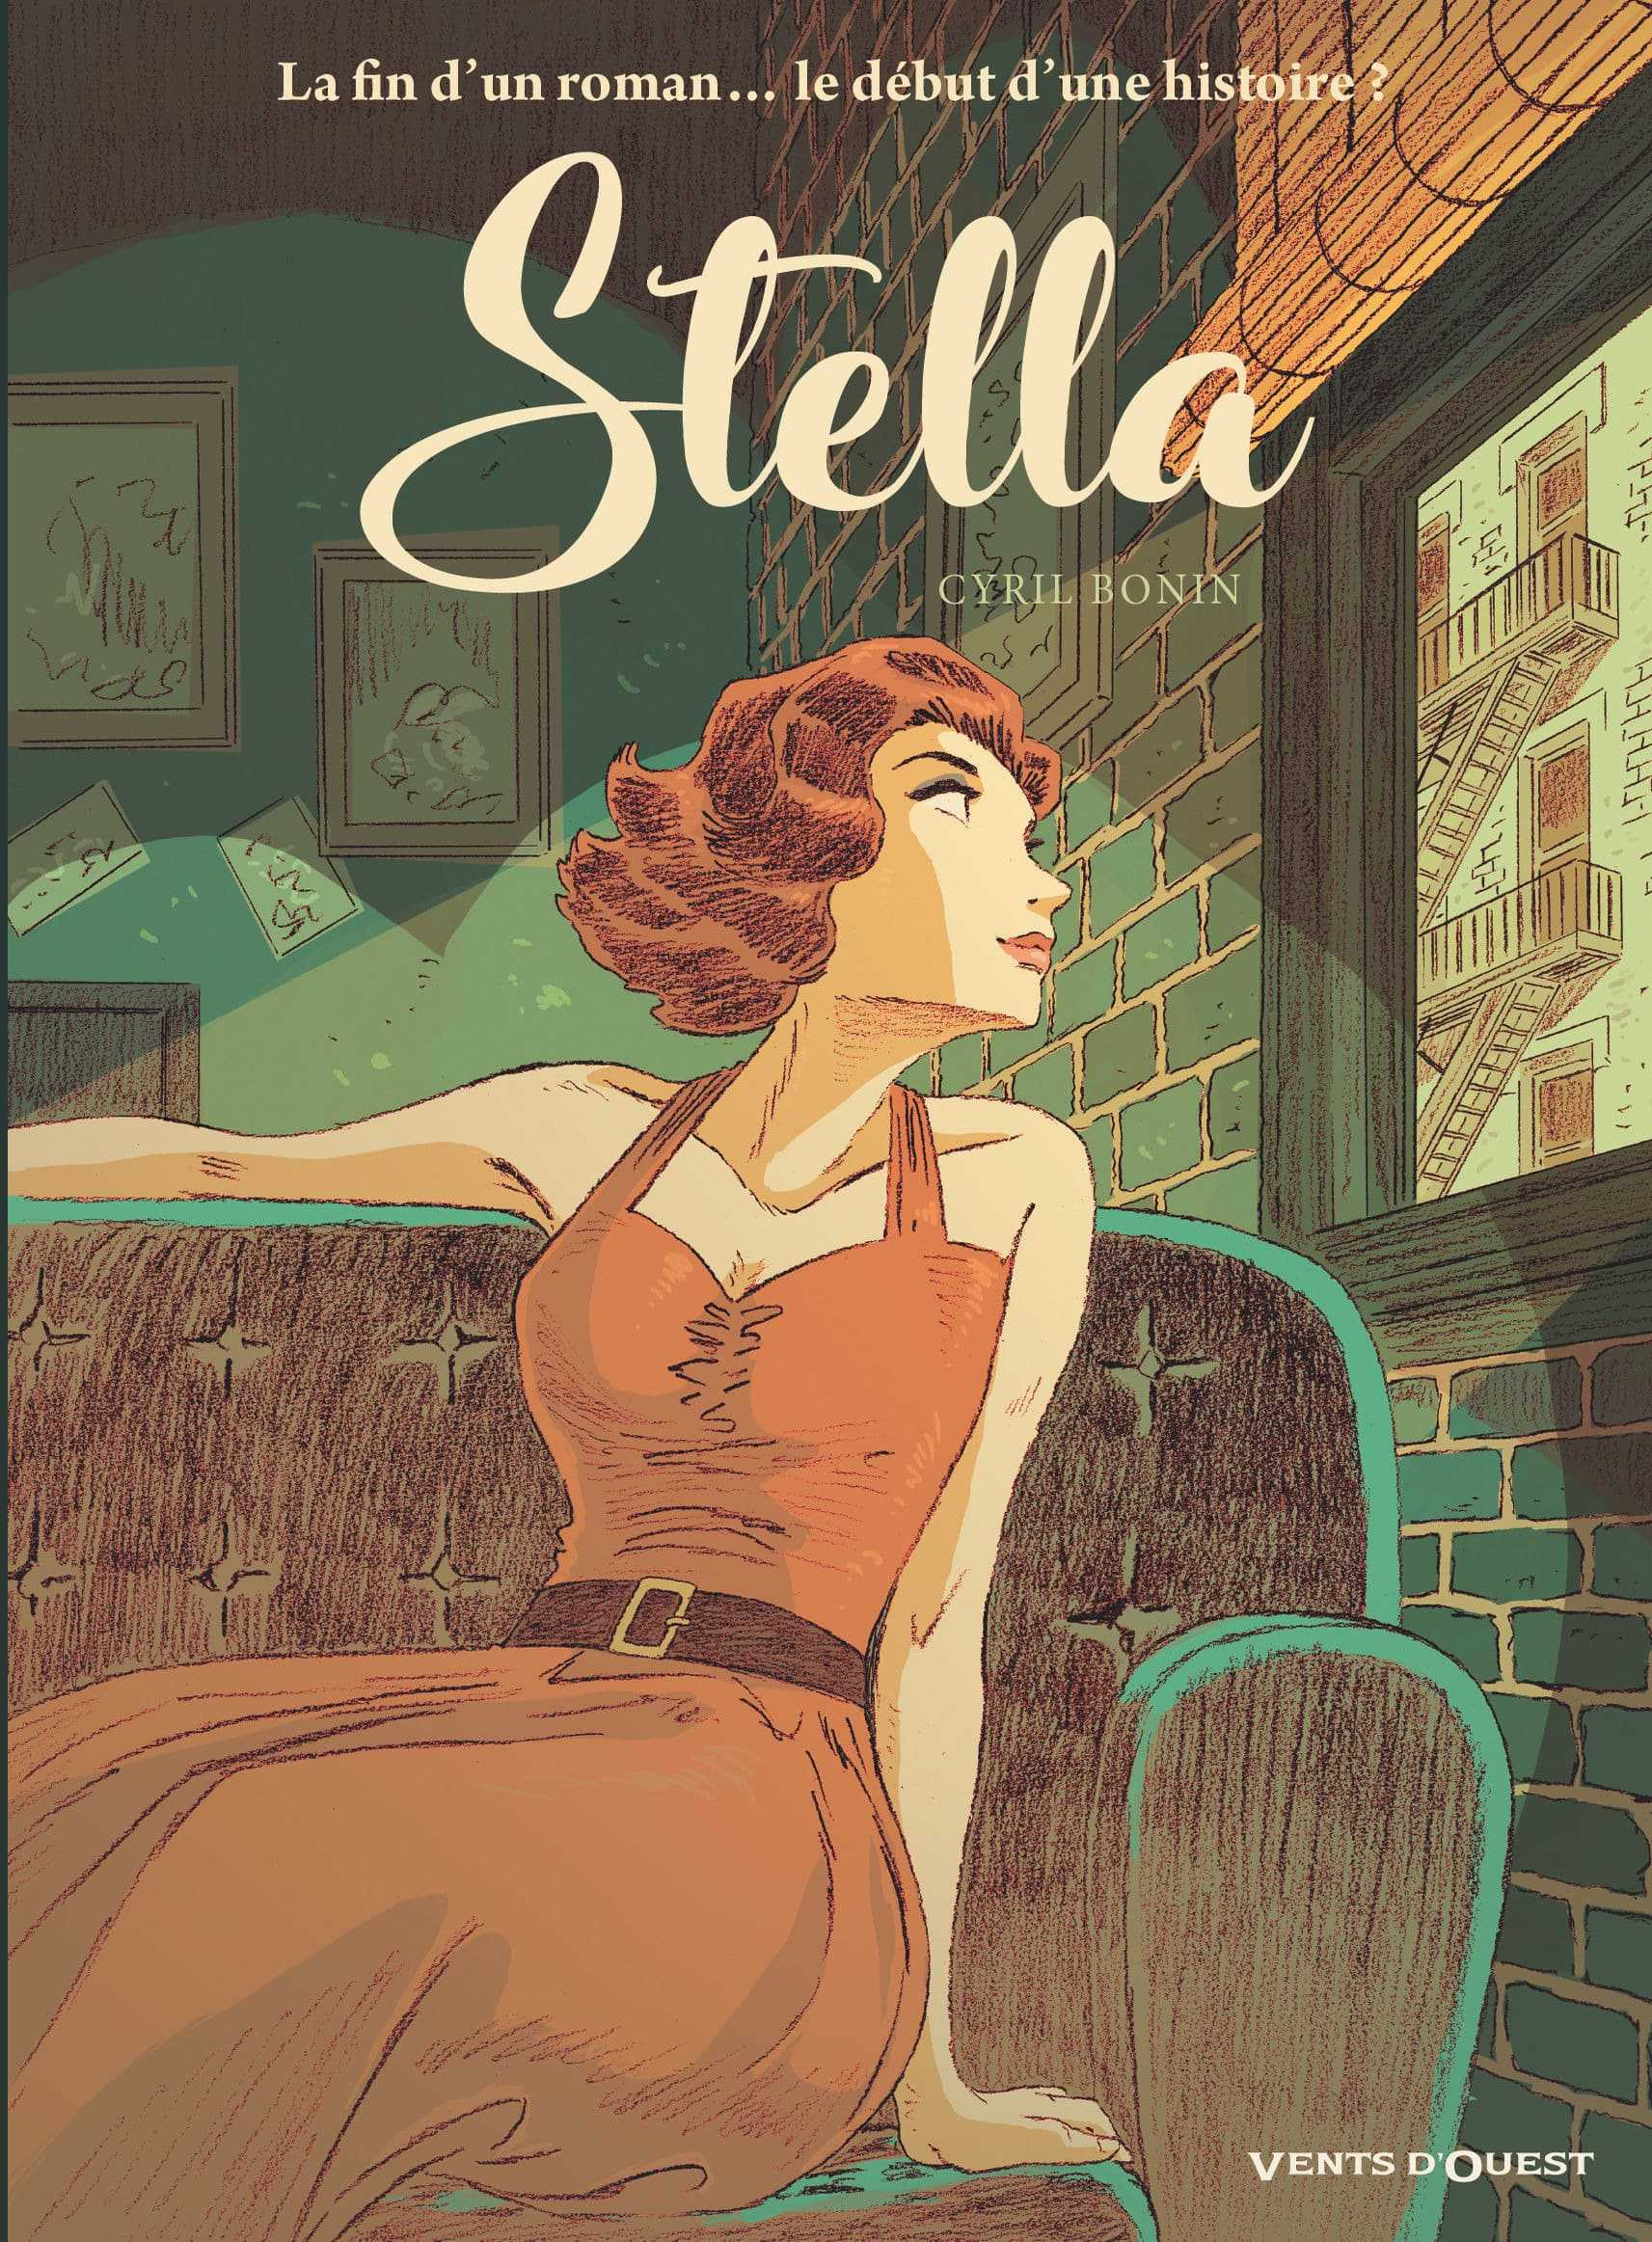 Stella, auteur apprenti sorcier